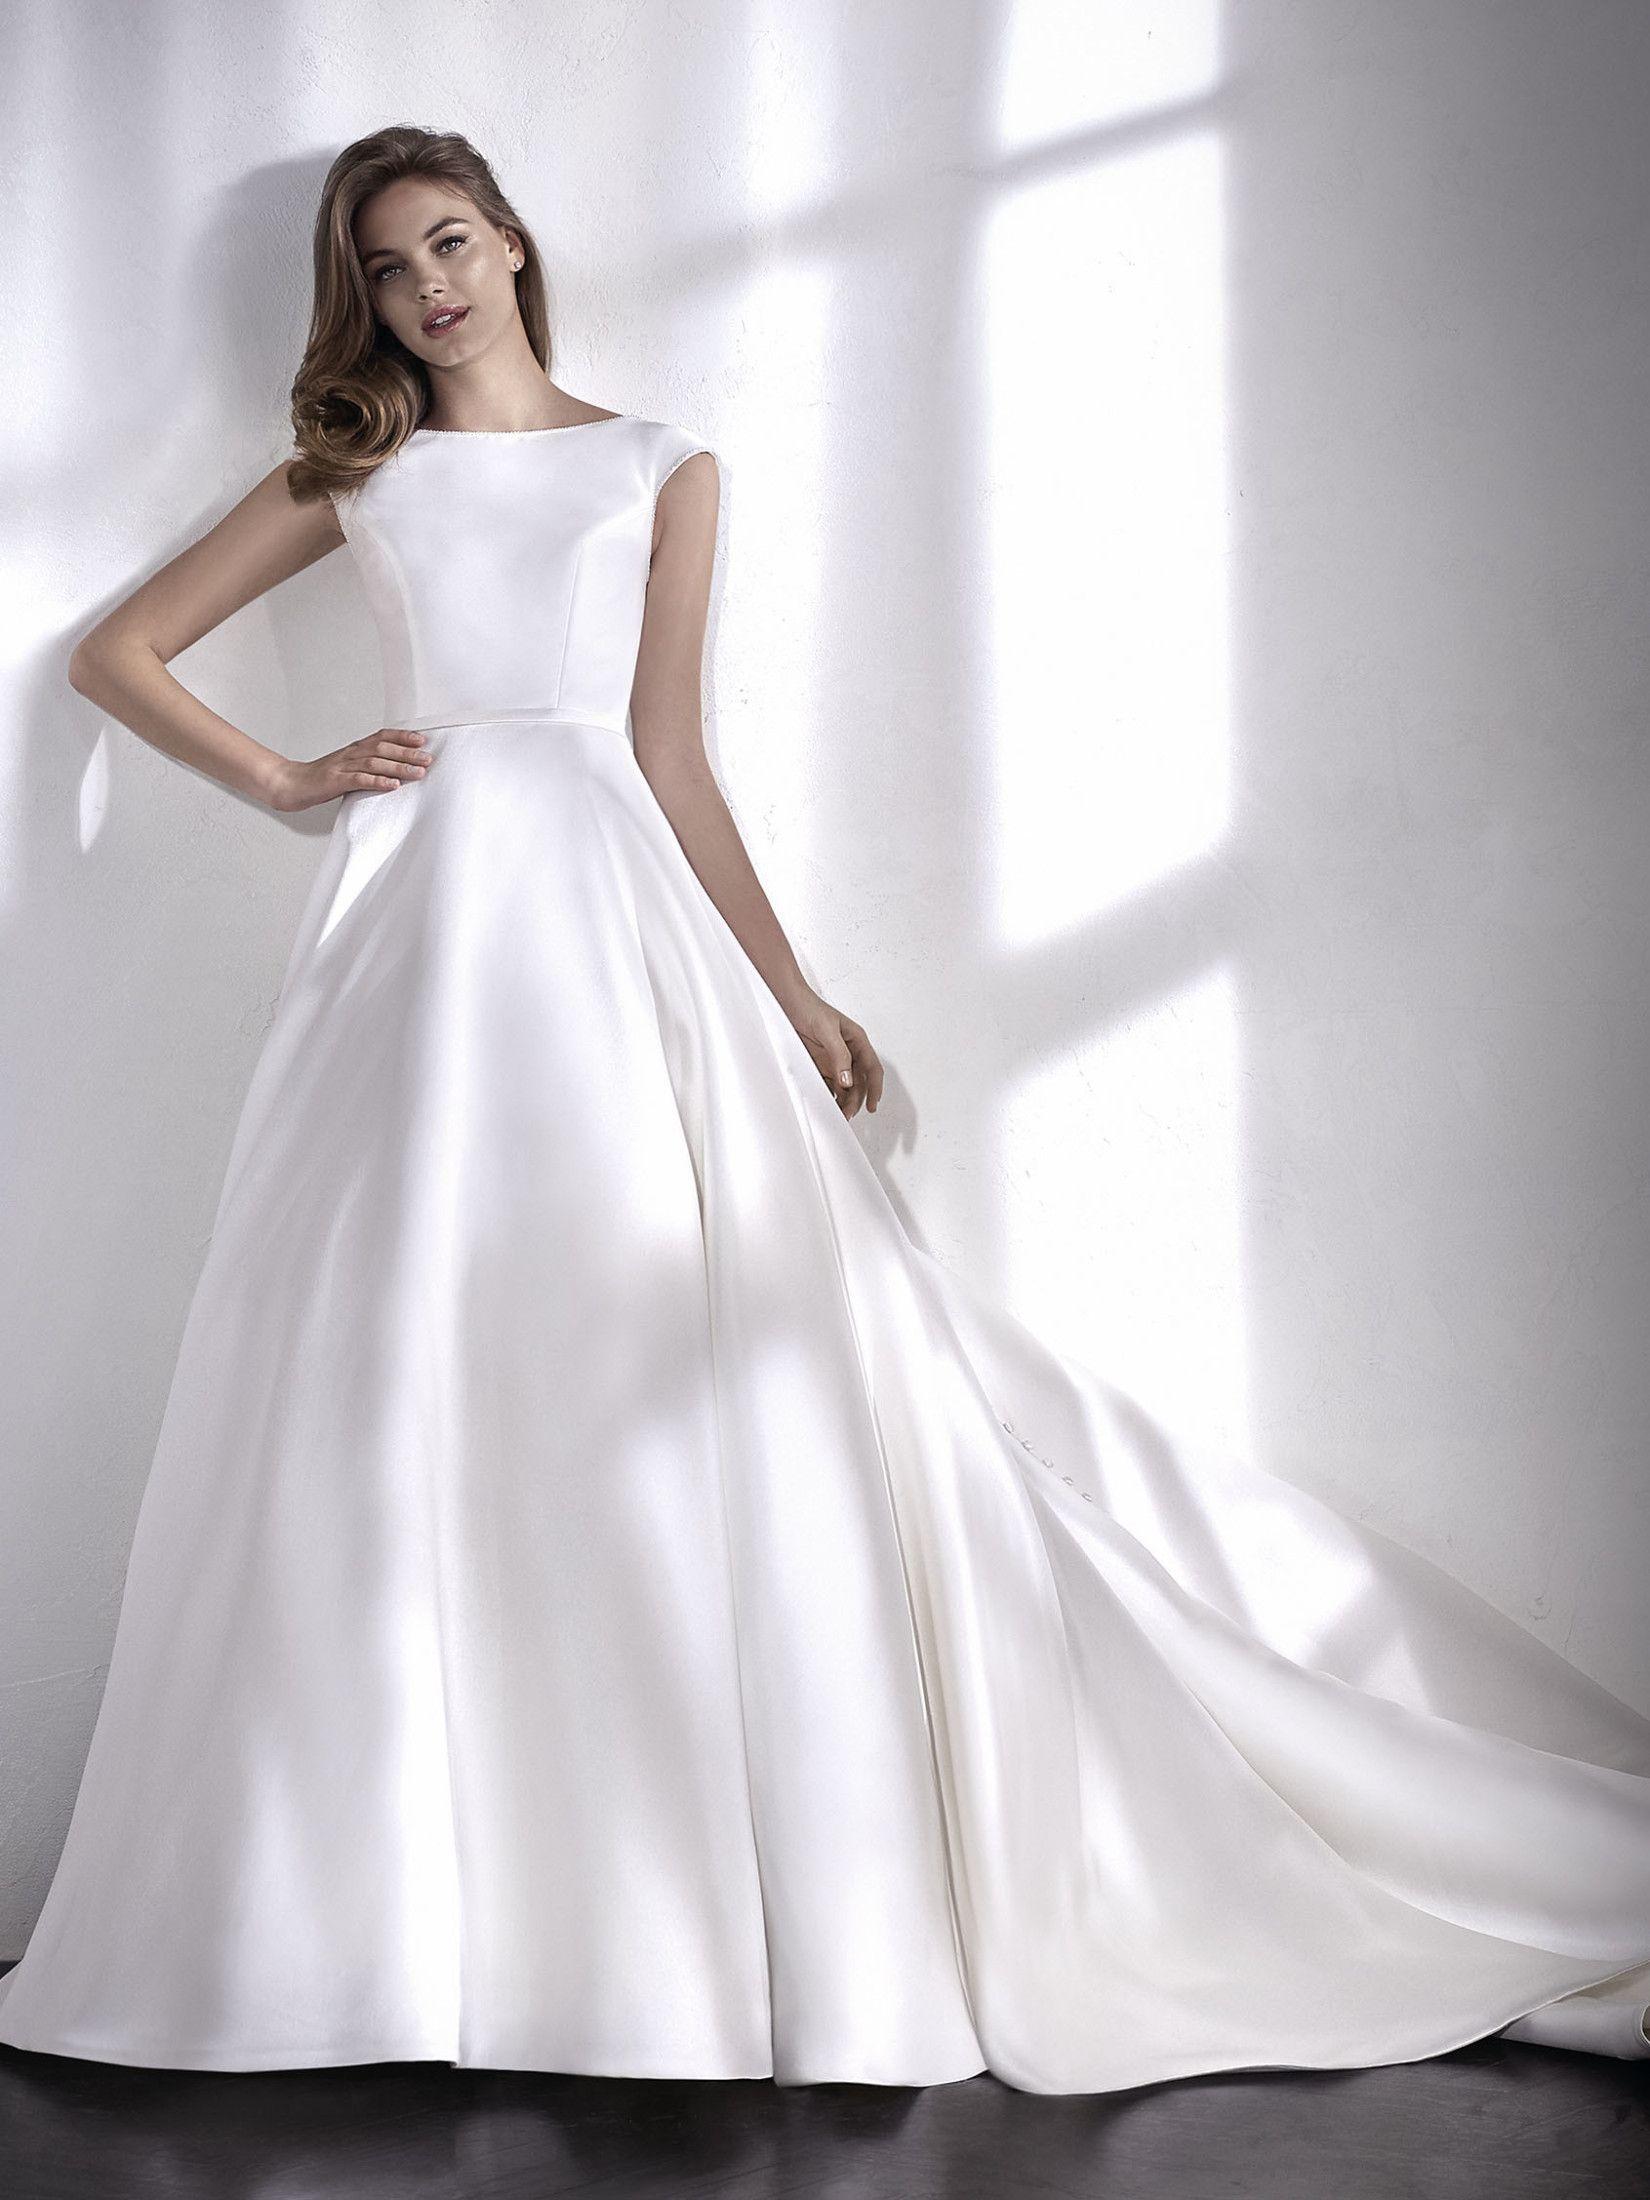 Plain & Simple Wedding Dress | Simple weddings, Plain wedding dress ...